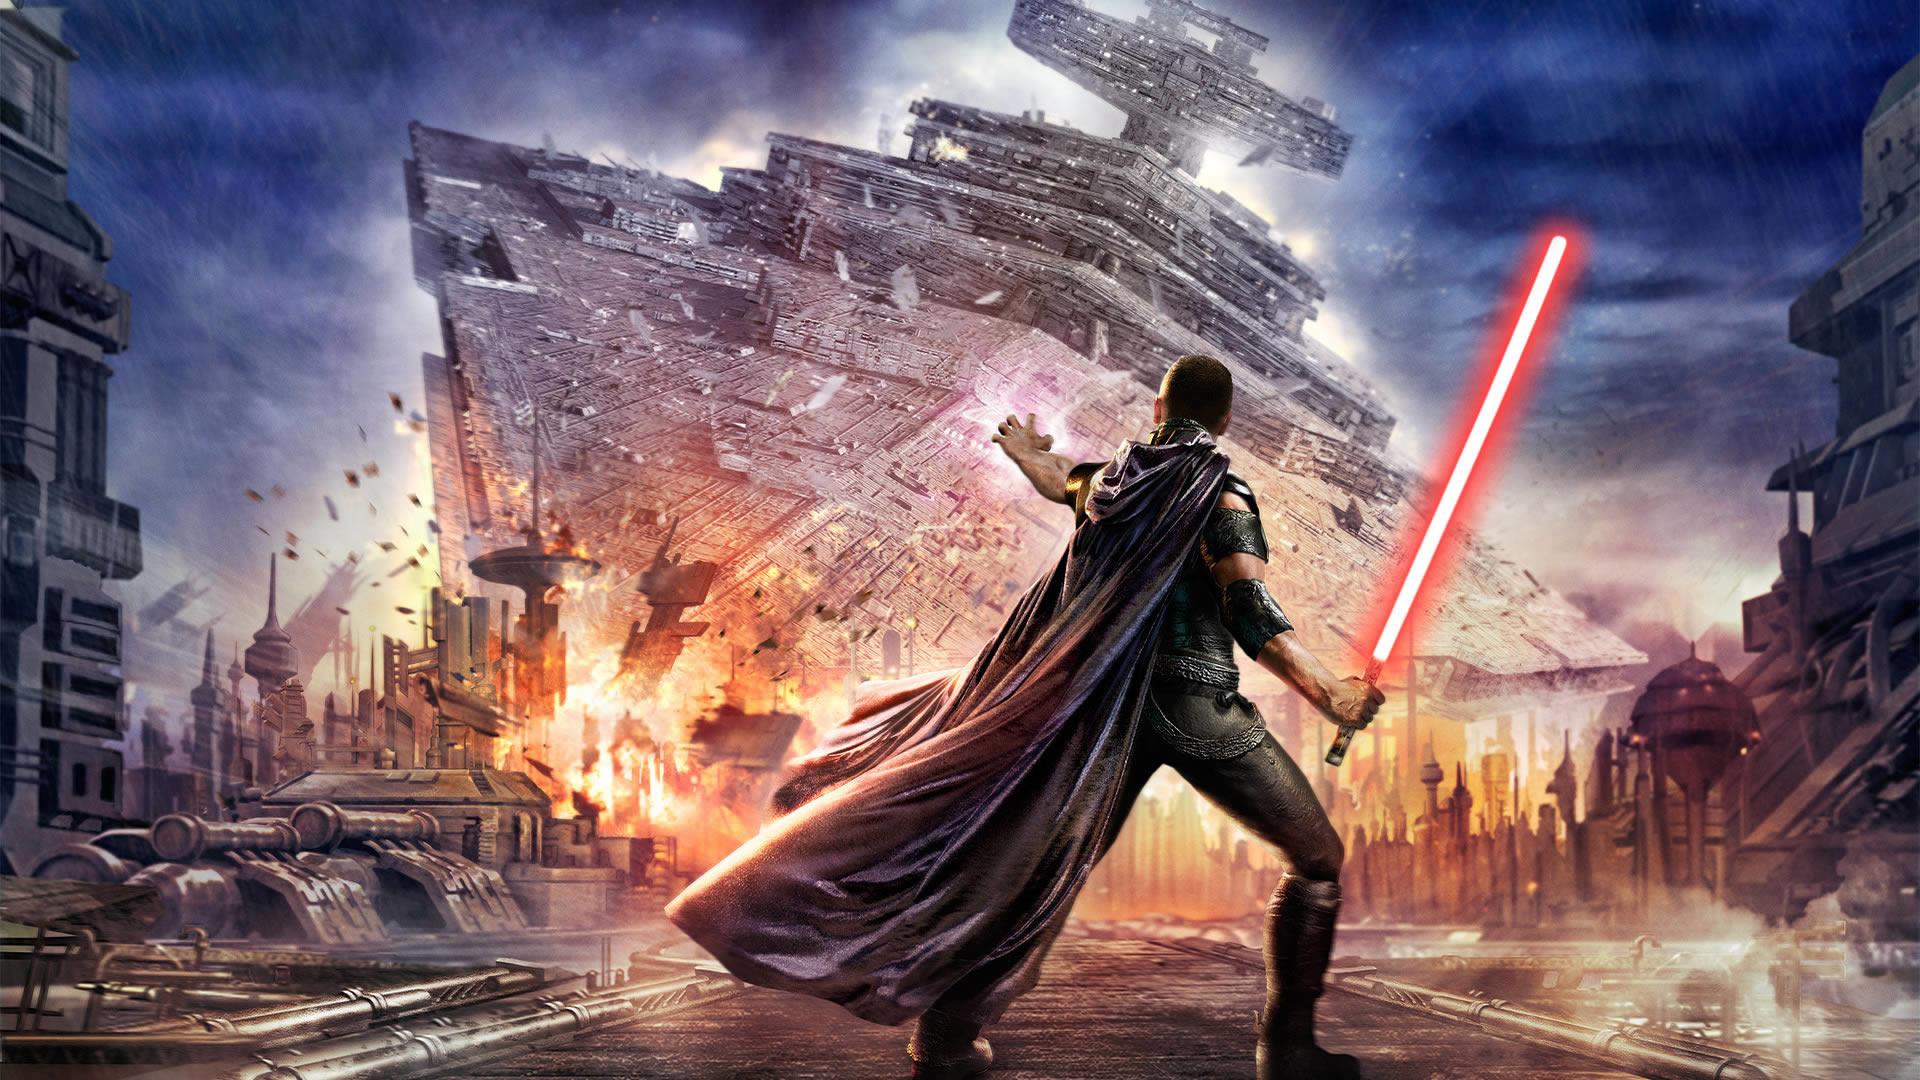 star-wars-wallpapers. vader-portrait. force-unleashed3